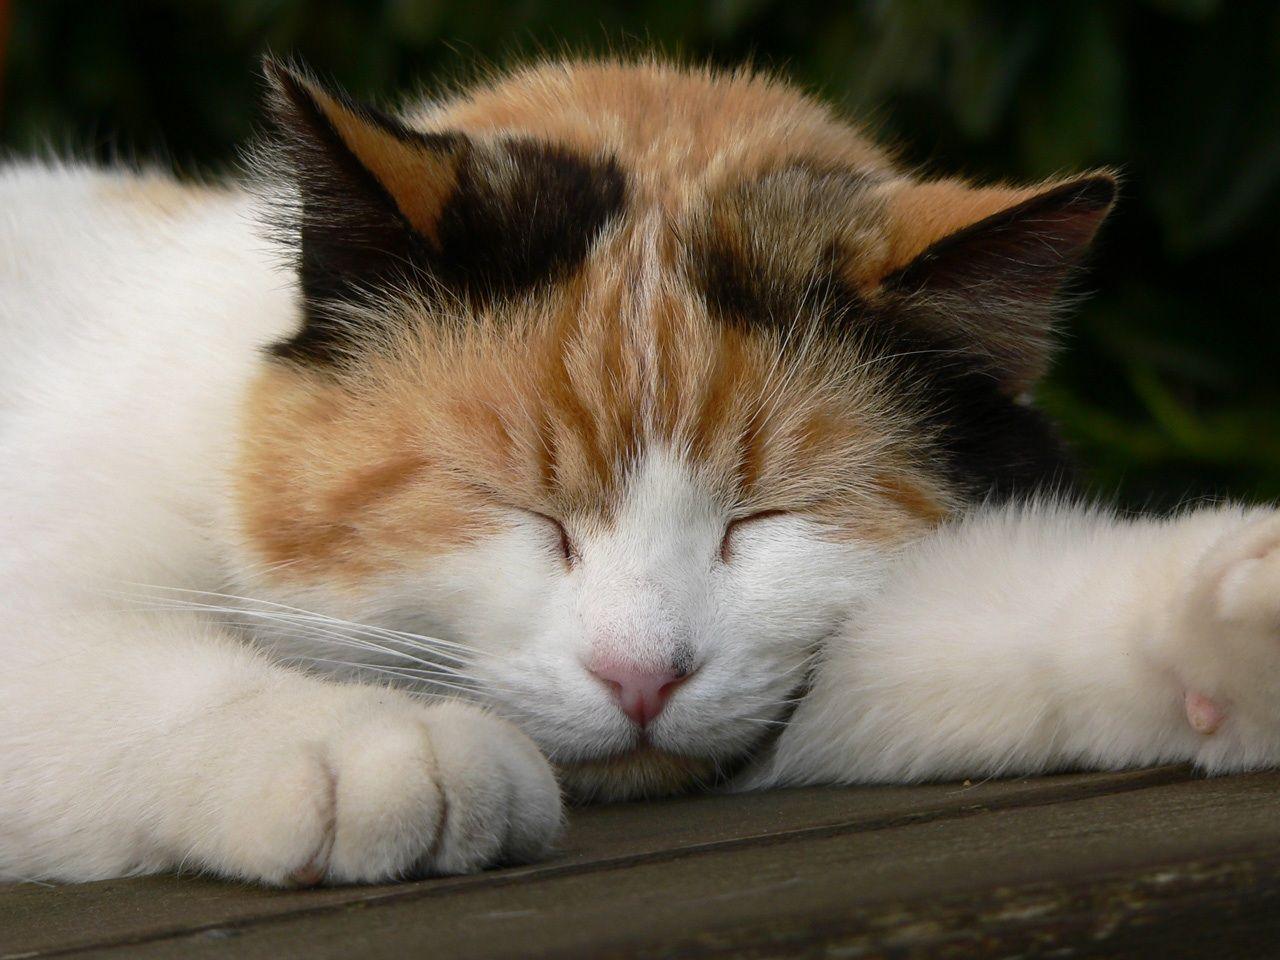 gurotesque https//t.co/OqDEO6U3Qk Animals, Meows, Cats